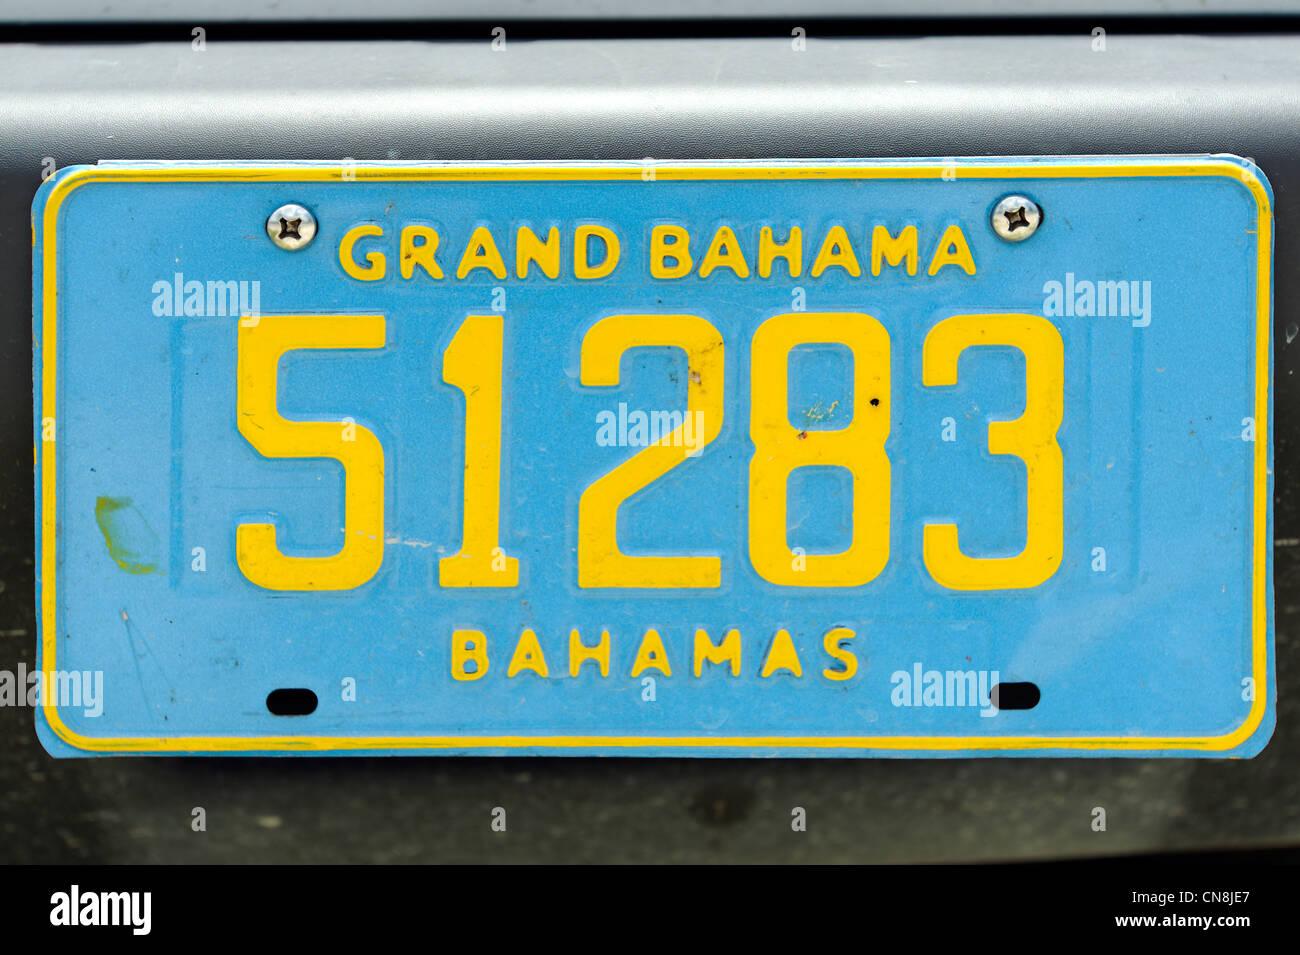 Bahamas, Grand Bahama Island, Freeport, automobile license plate - Stock Image